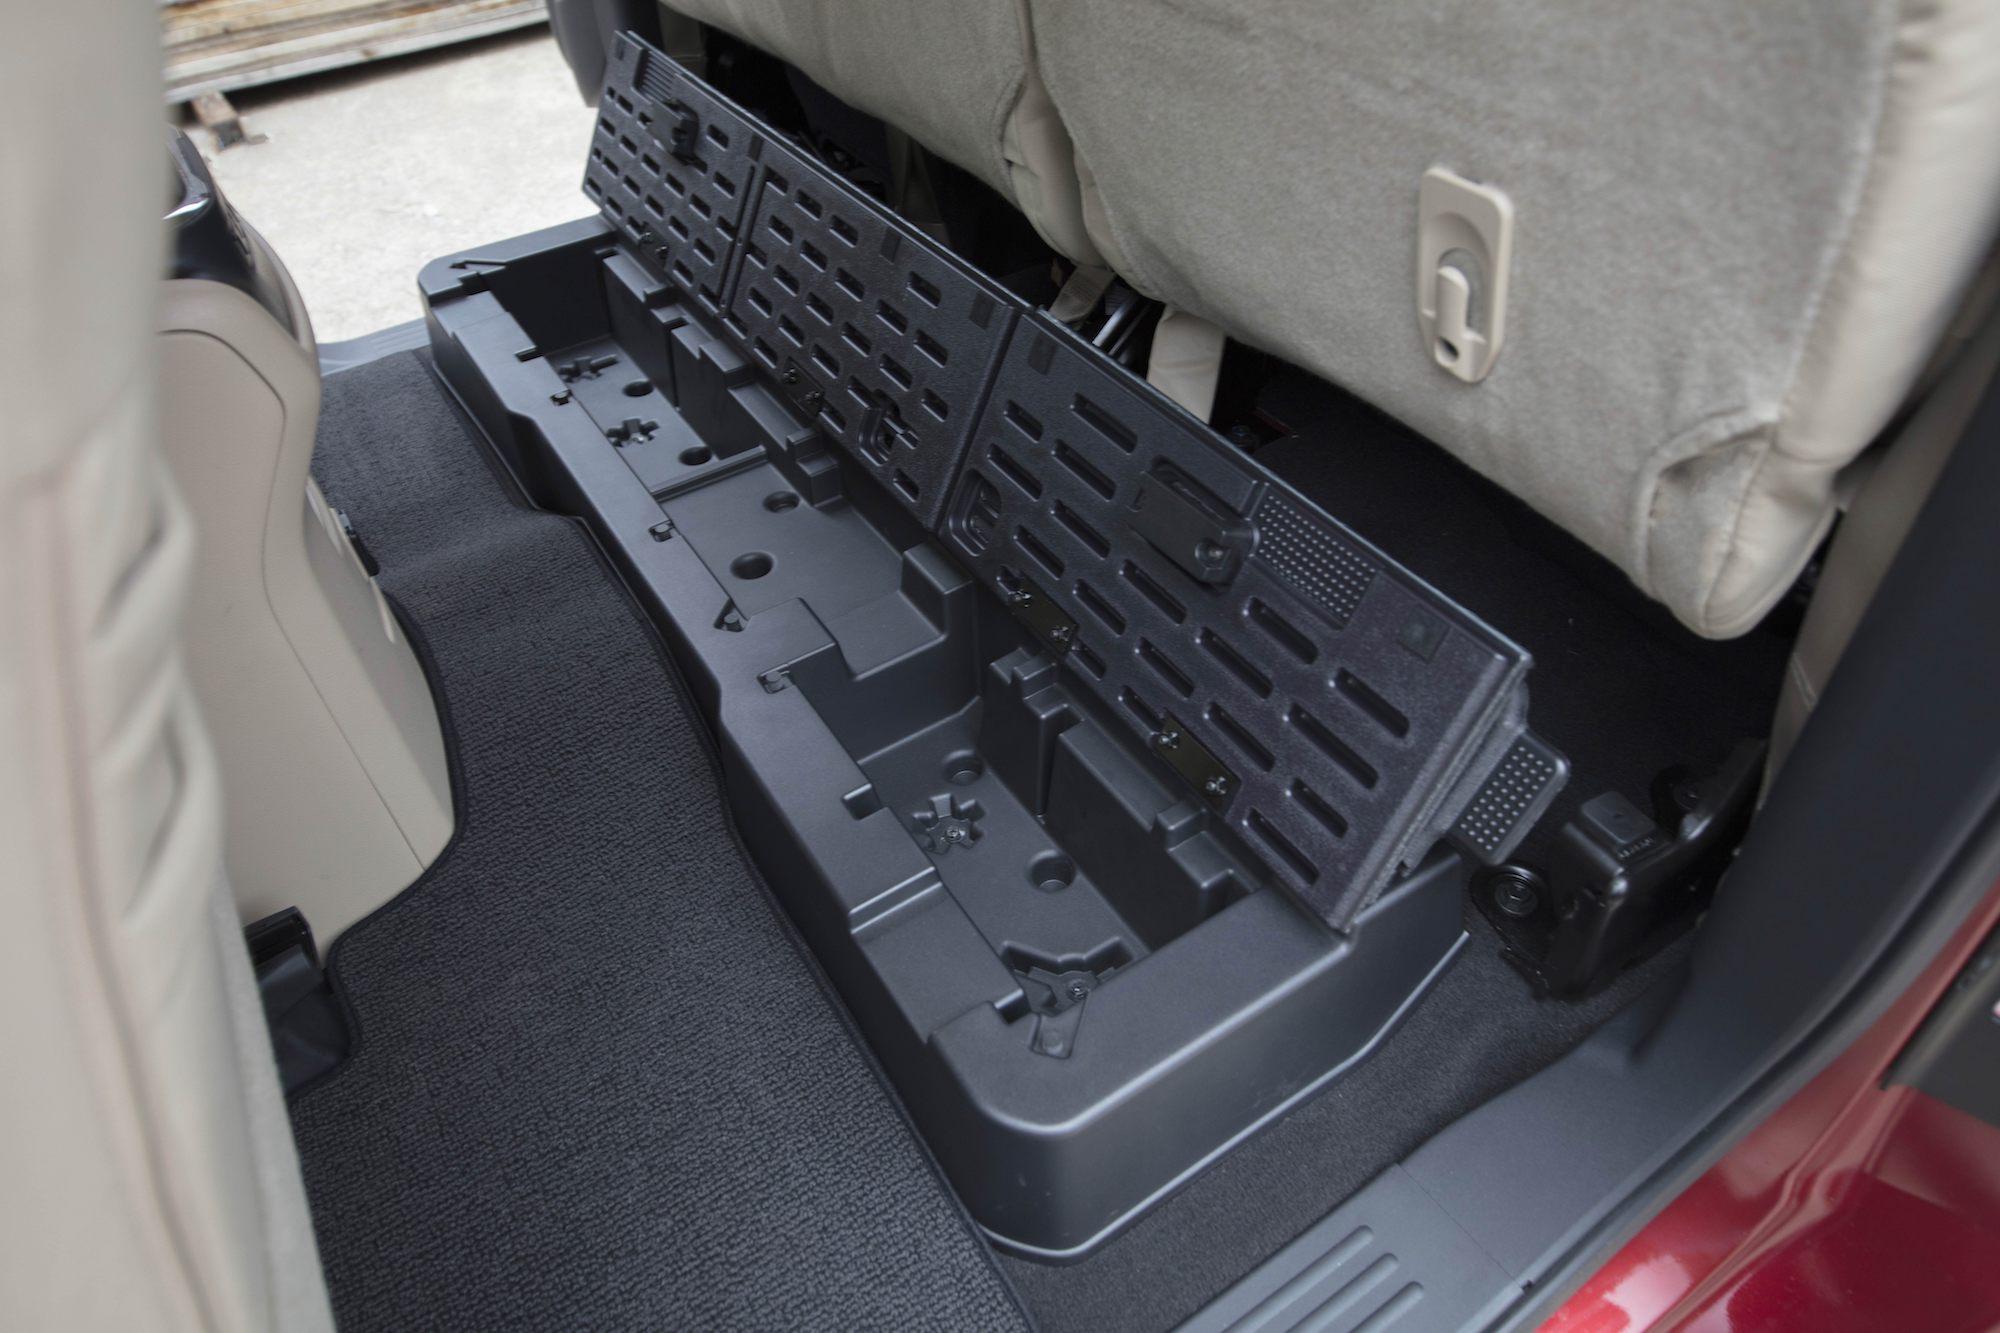 Nissan Intros Titan Titan Xd King Cab With Rear Seat